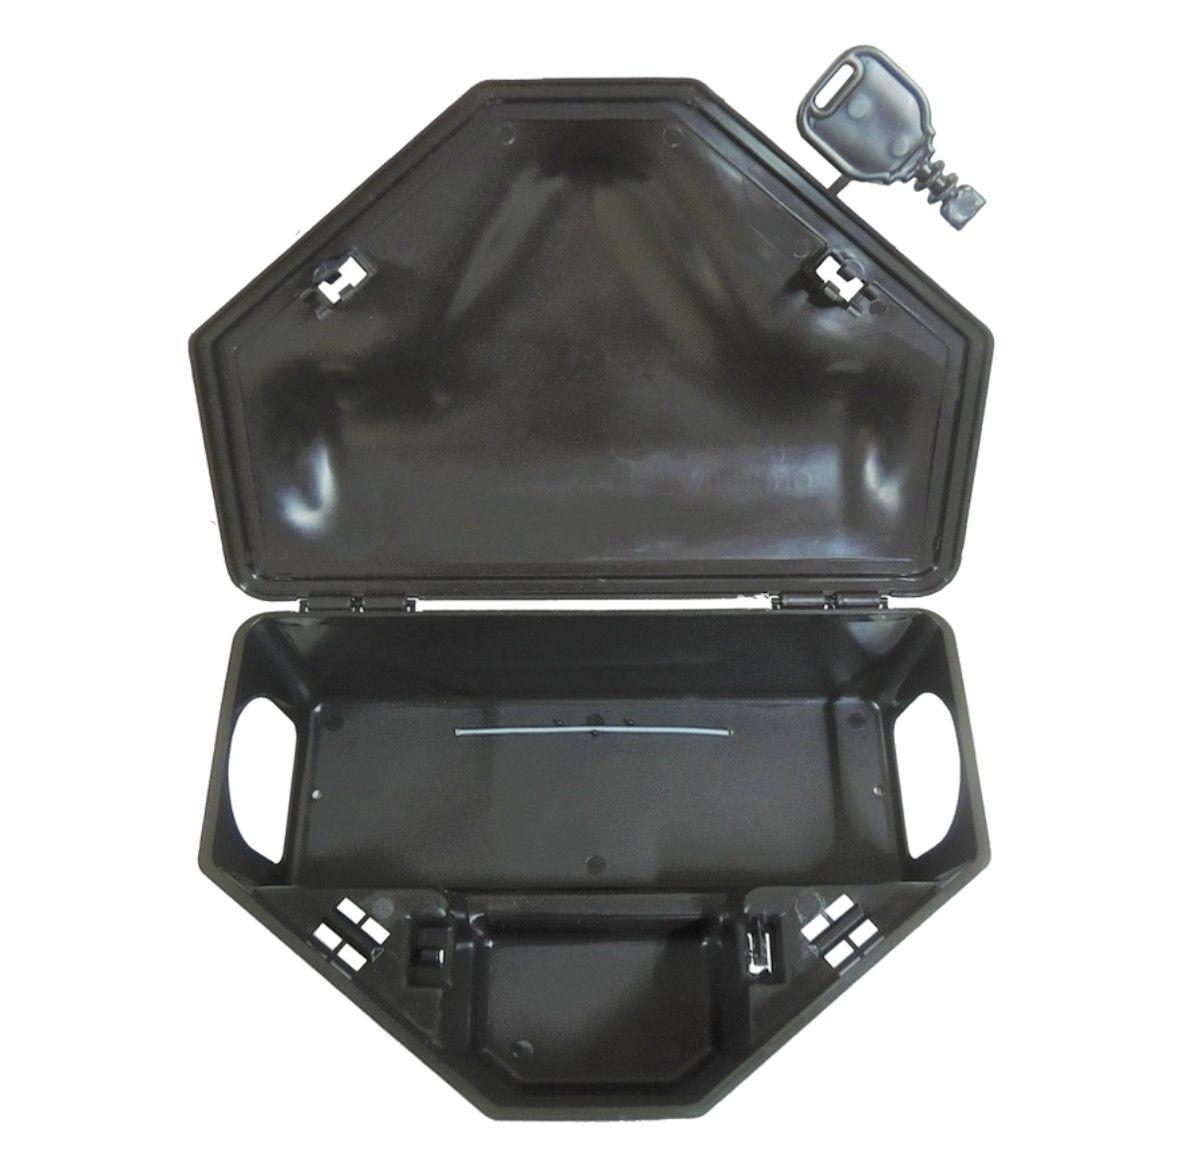 Kit 61 Porta Isca Com 2 Chaves - Duplo Travamento